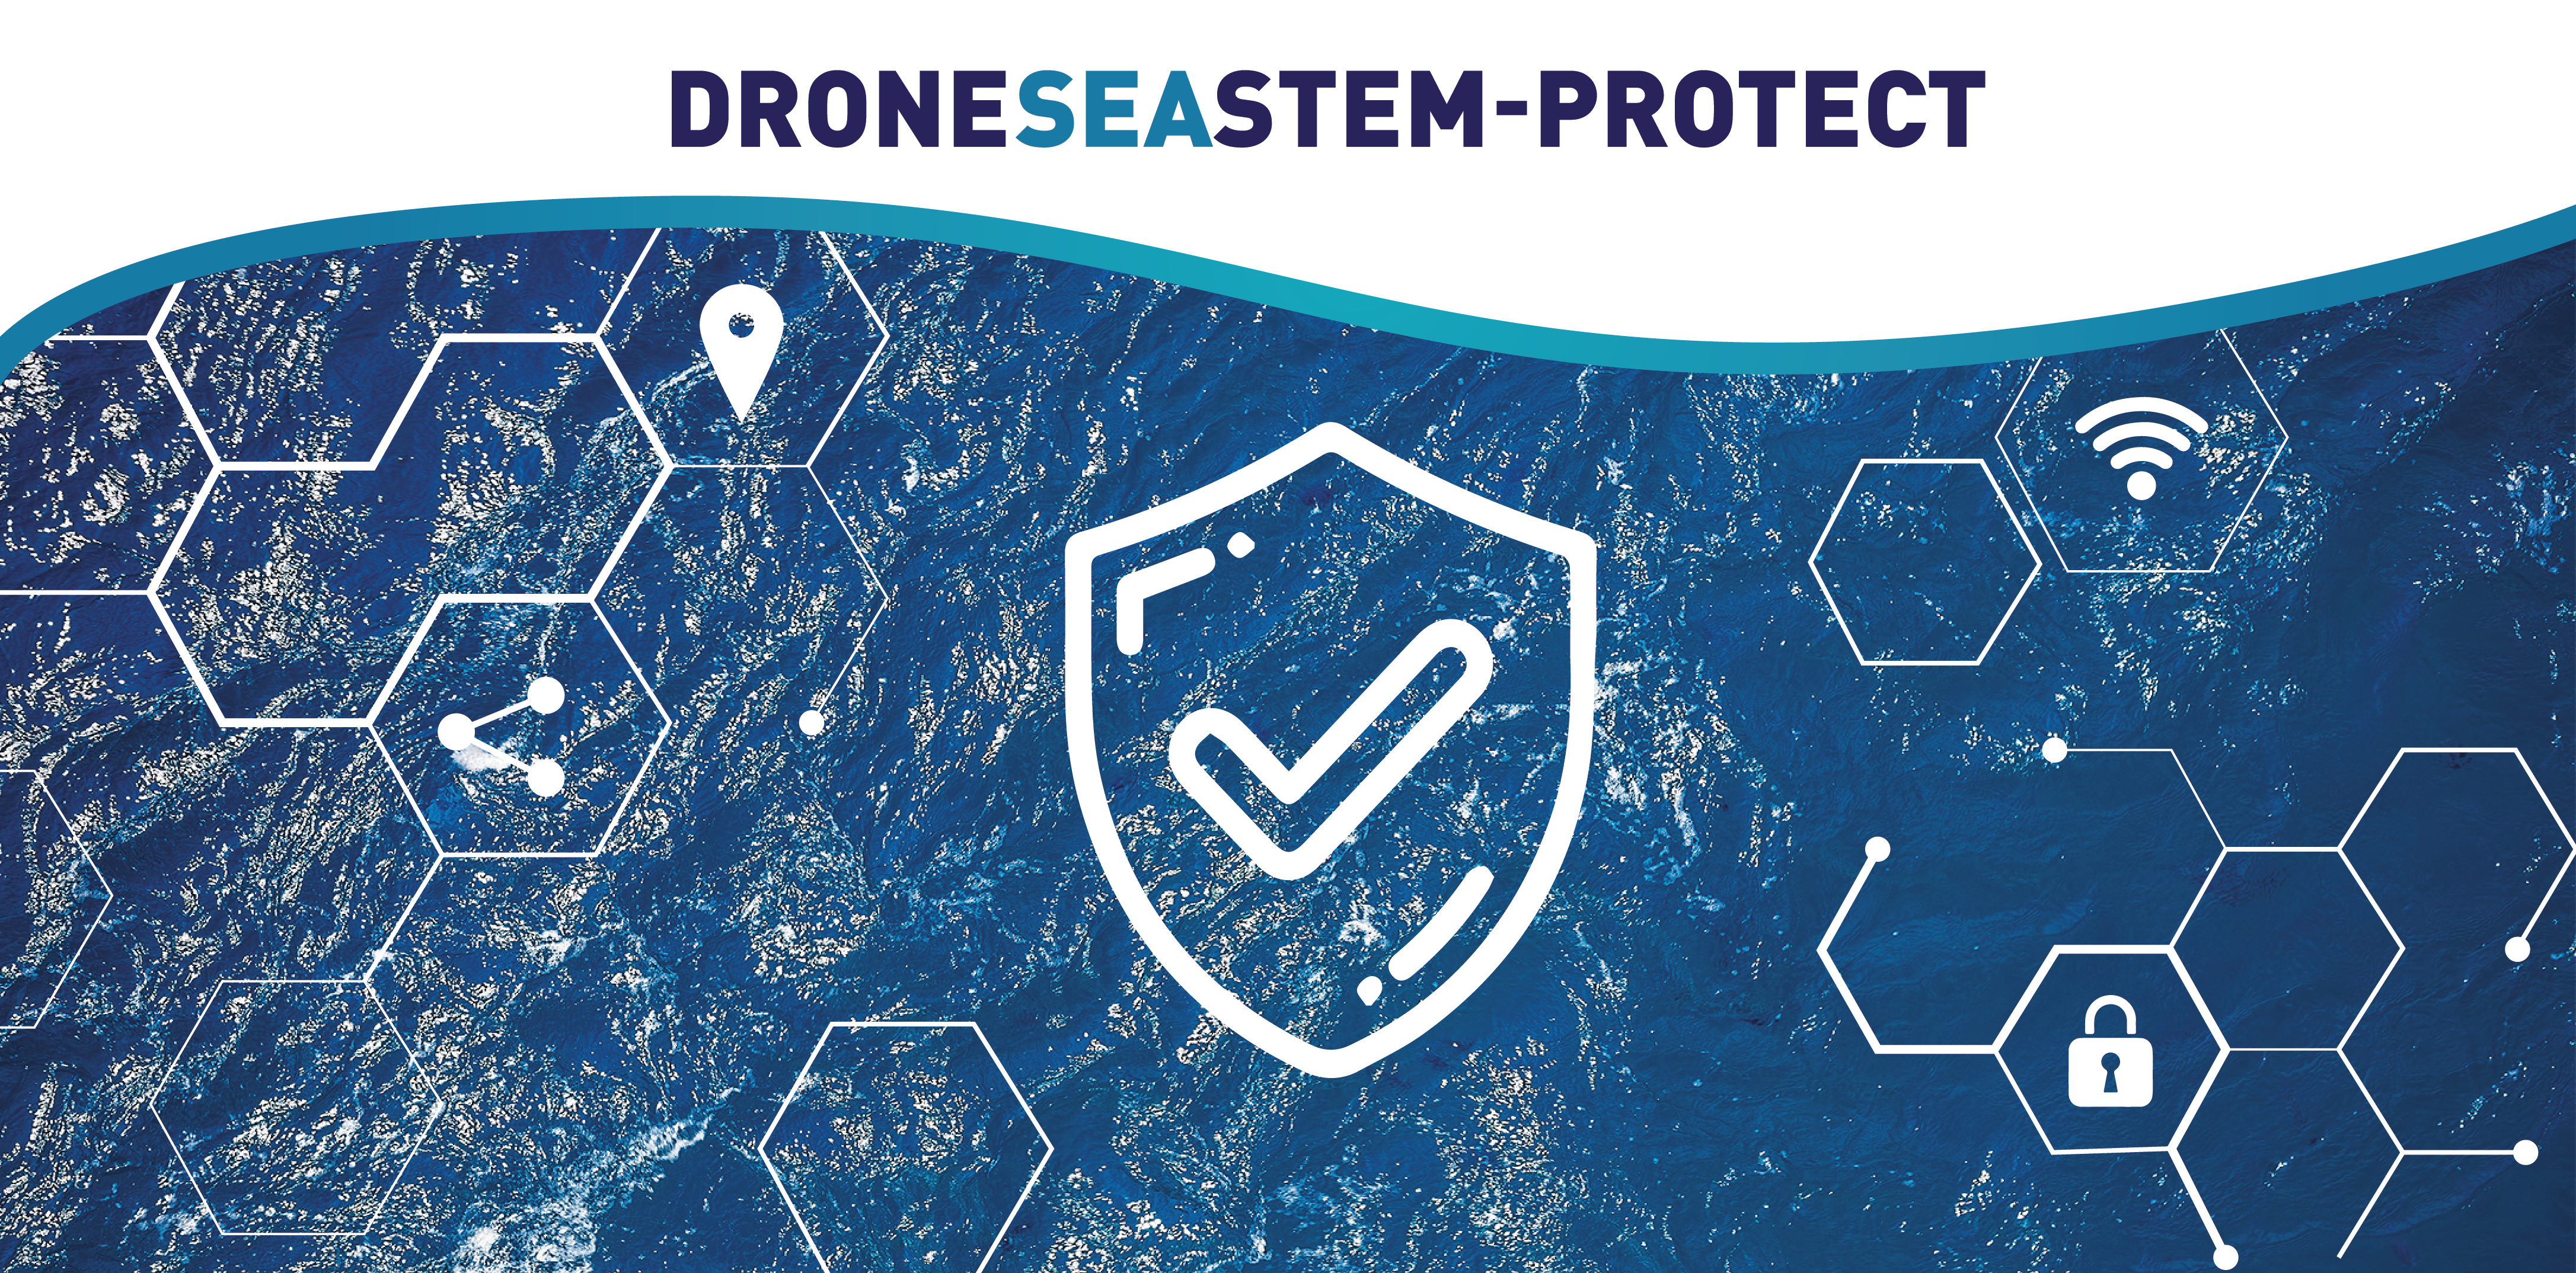 eca-group-news-droneseastem-protect